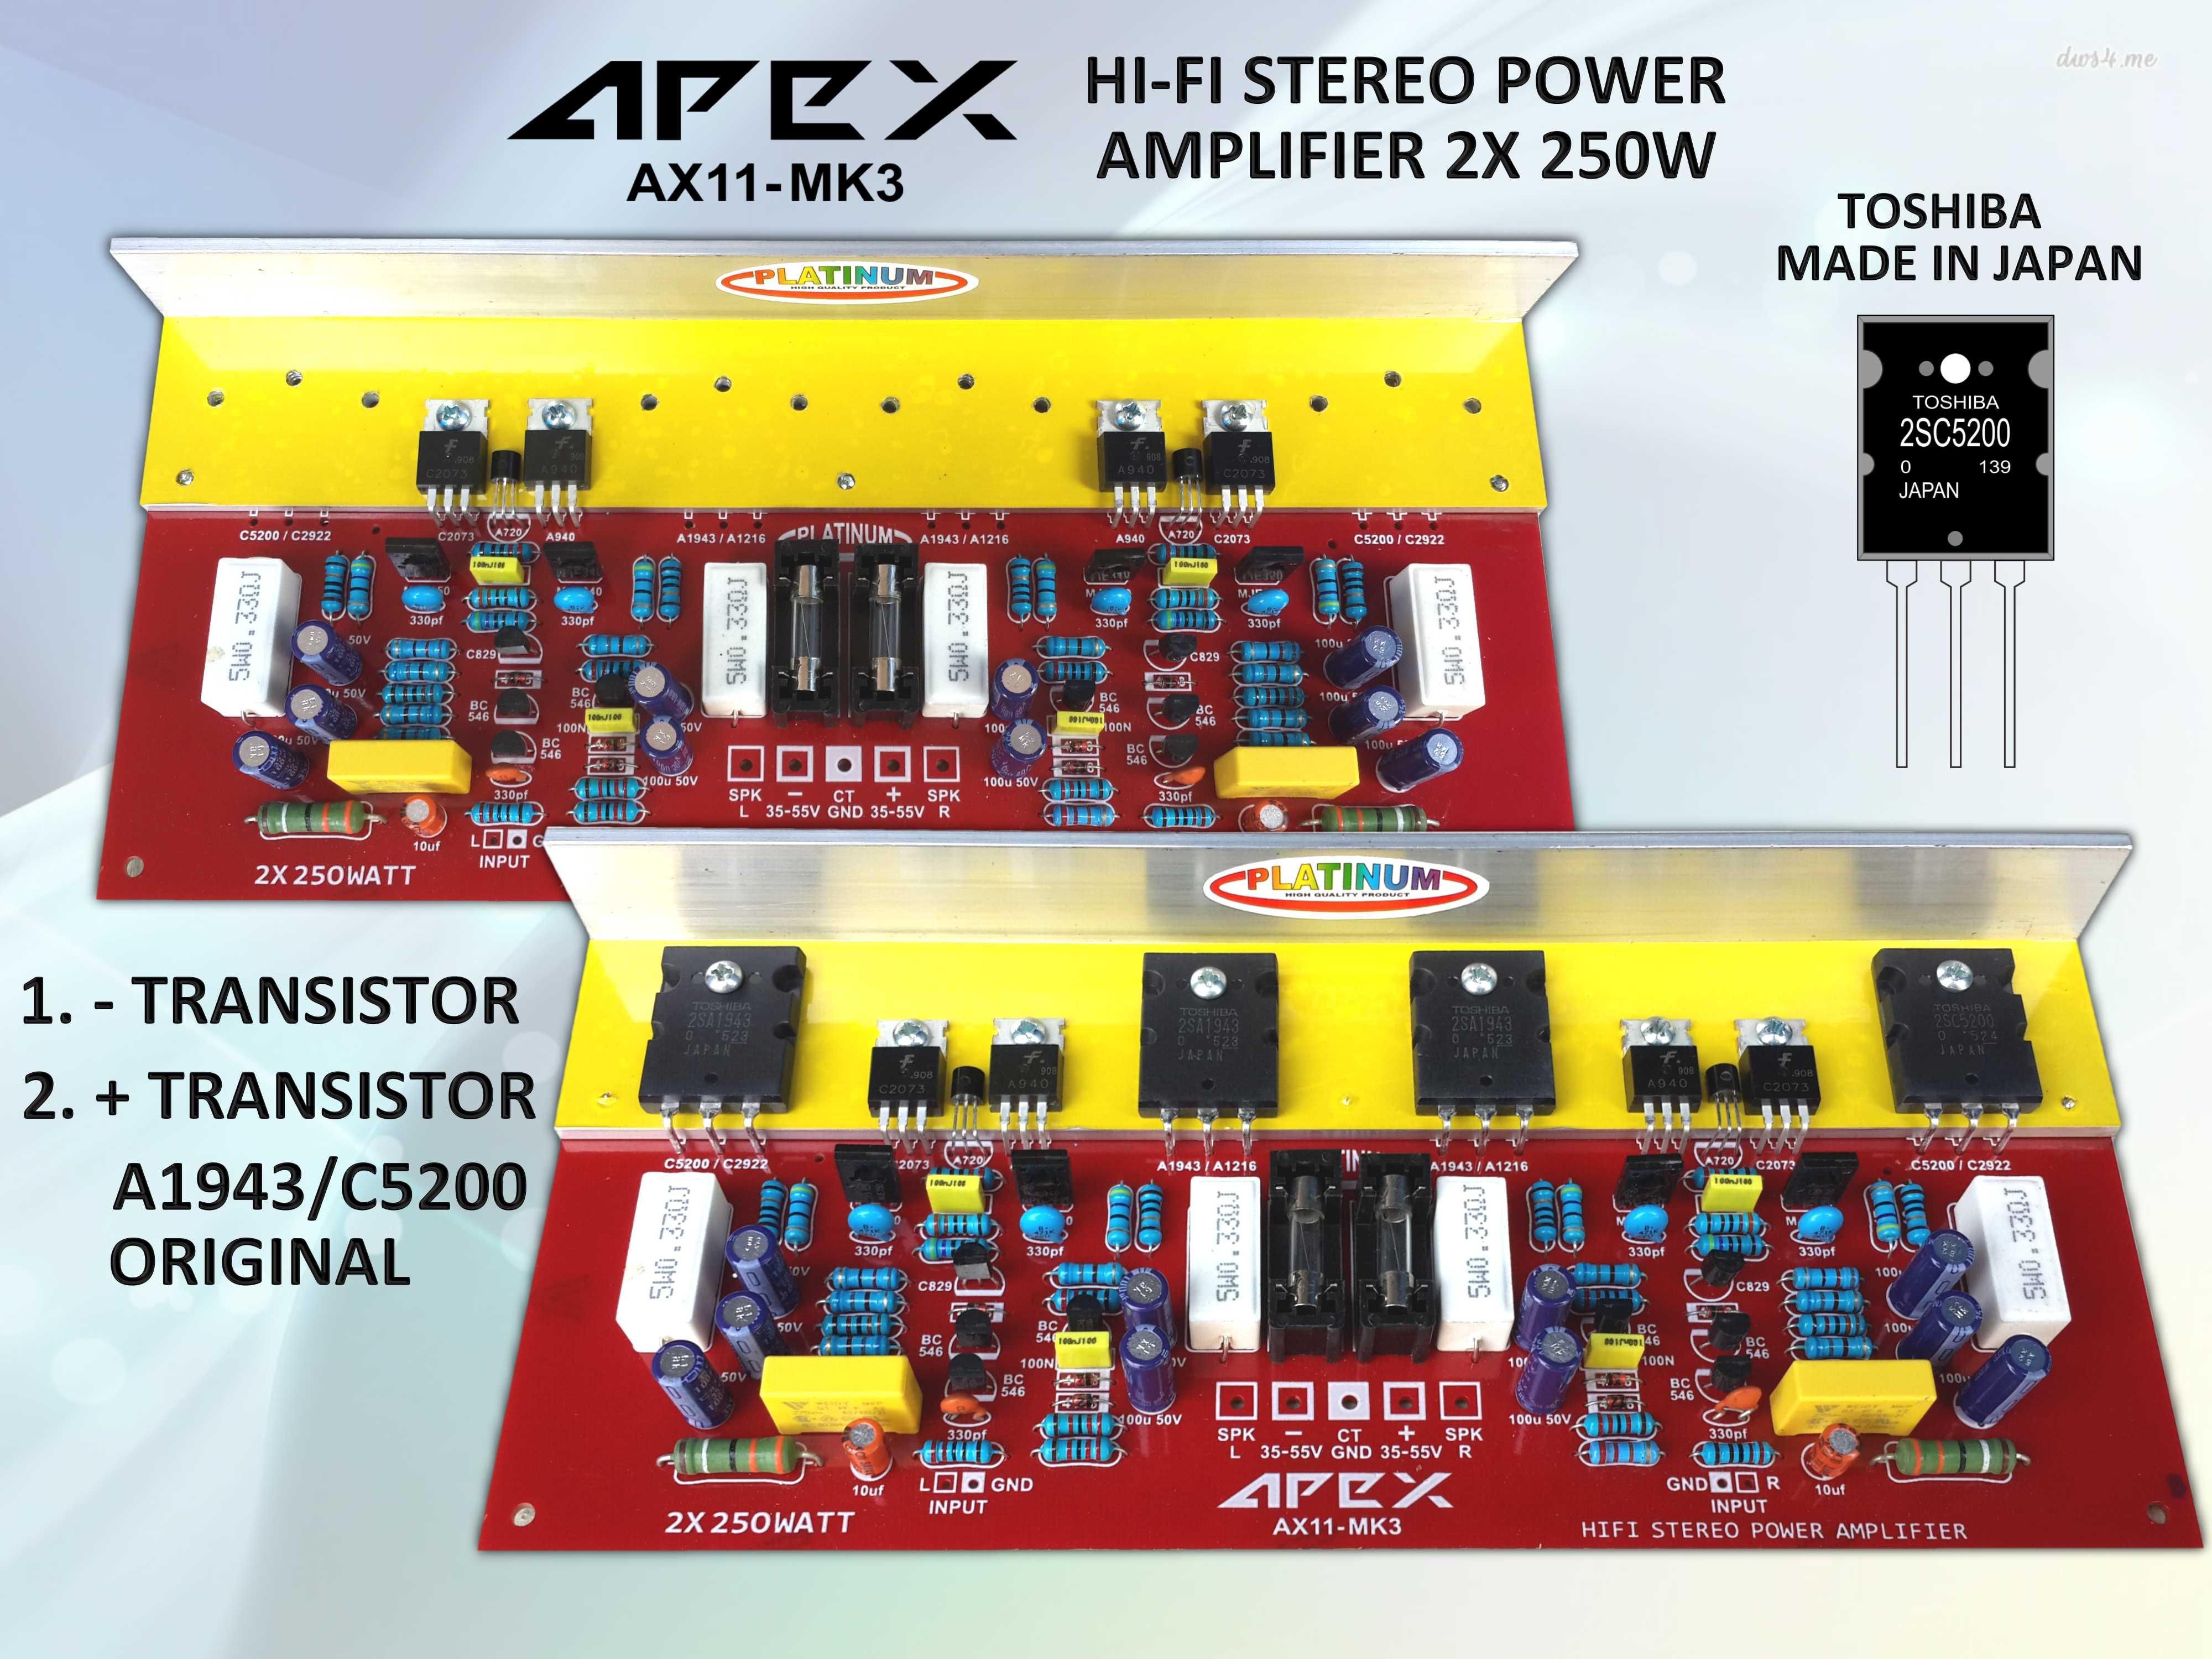 Https 2018 07 20 Restorasi Radio Tabung Philips Bin Indonesias Legendary Diy Power Amplifier 150w Ocl Img 20151111 110031